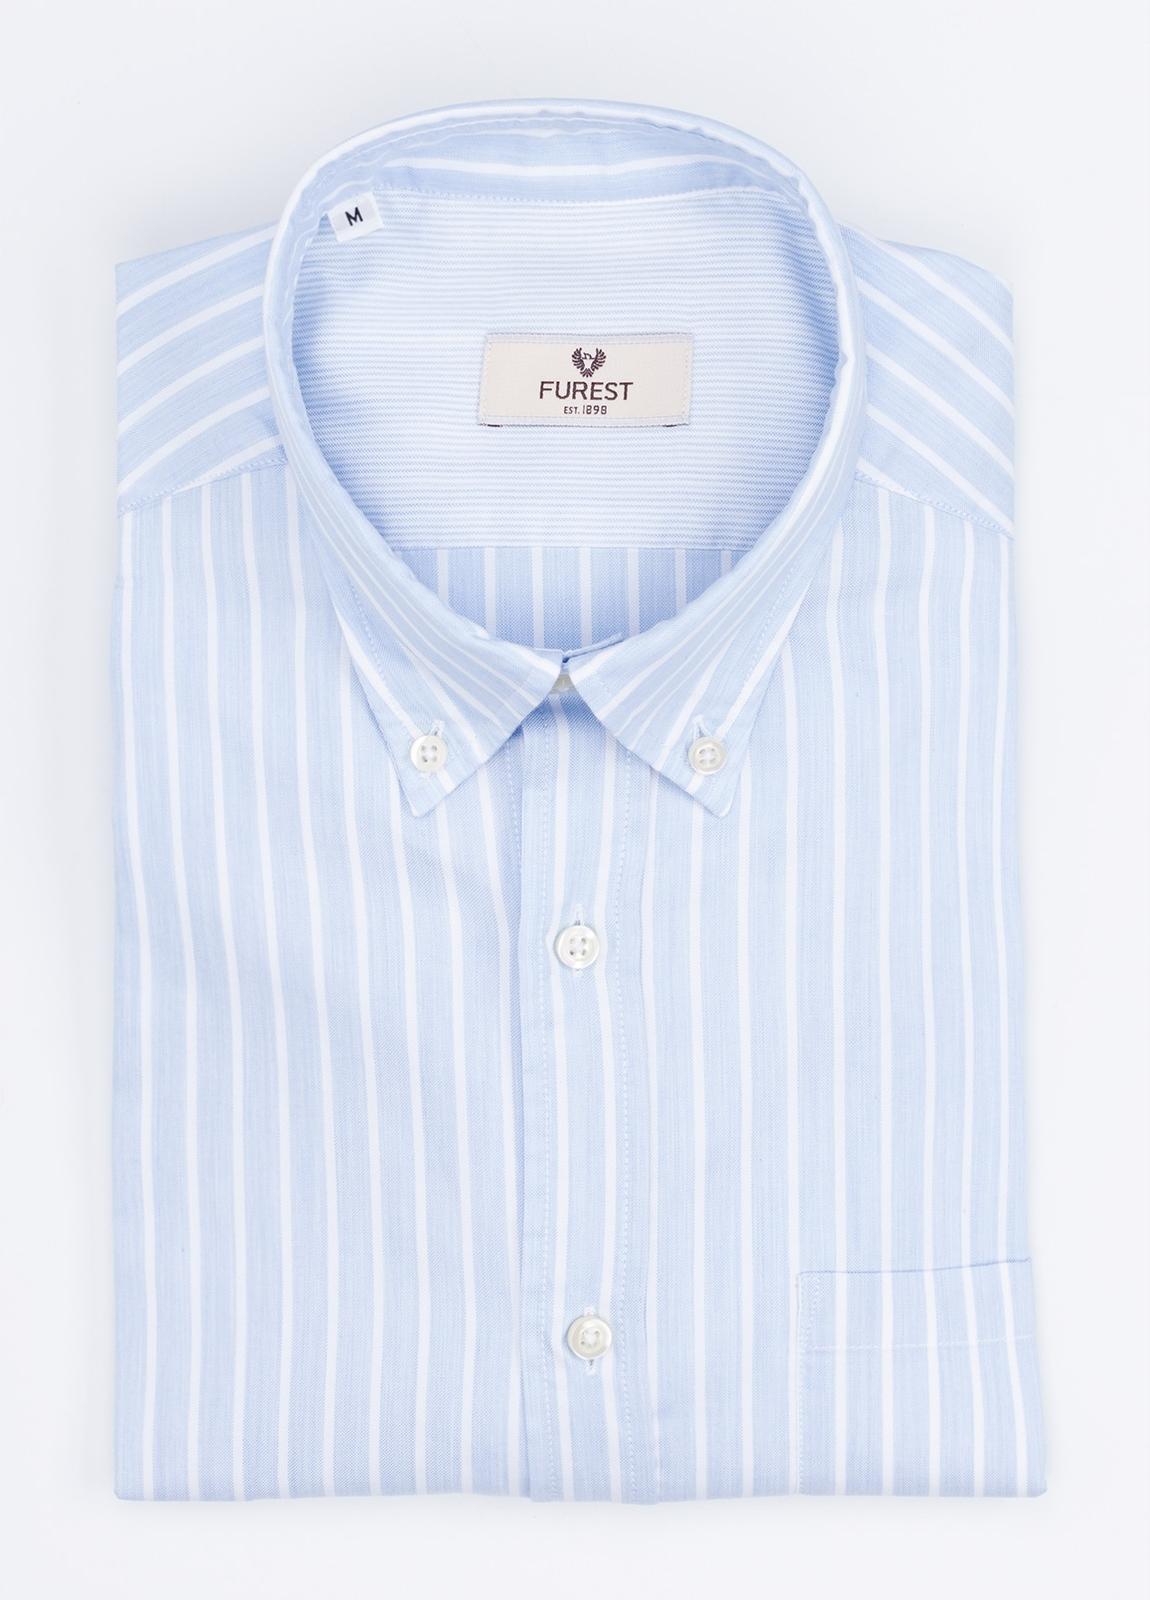 Camisa Leisure Wear REGULAR FIT Modelo BOTTON DOWN de rayas, color celeste. 100% Algodón.